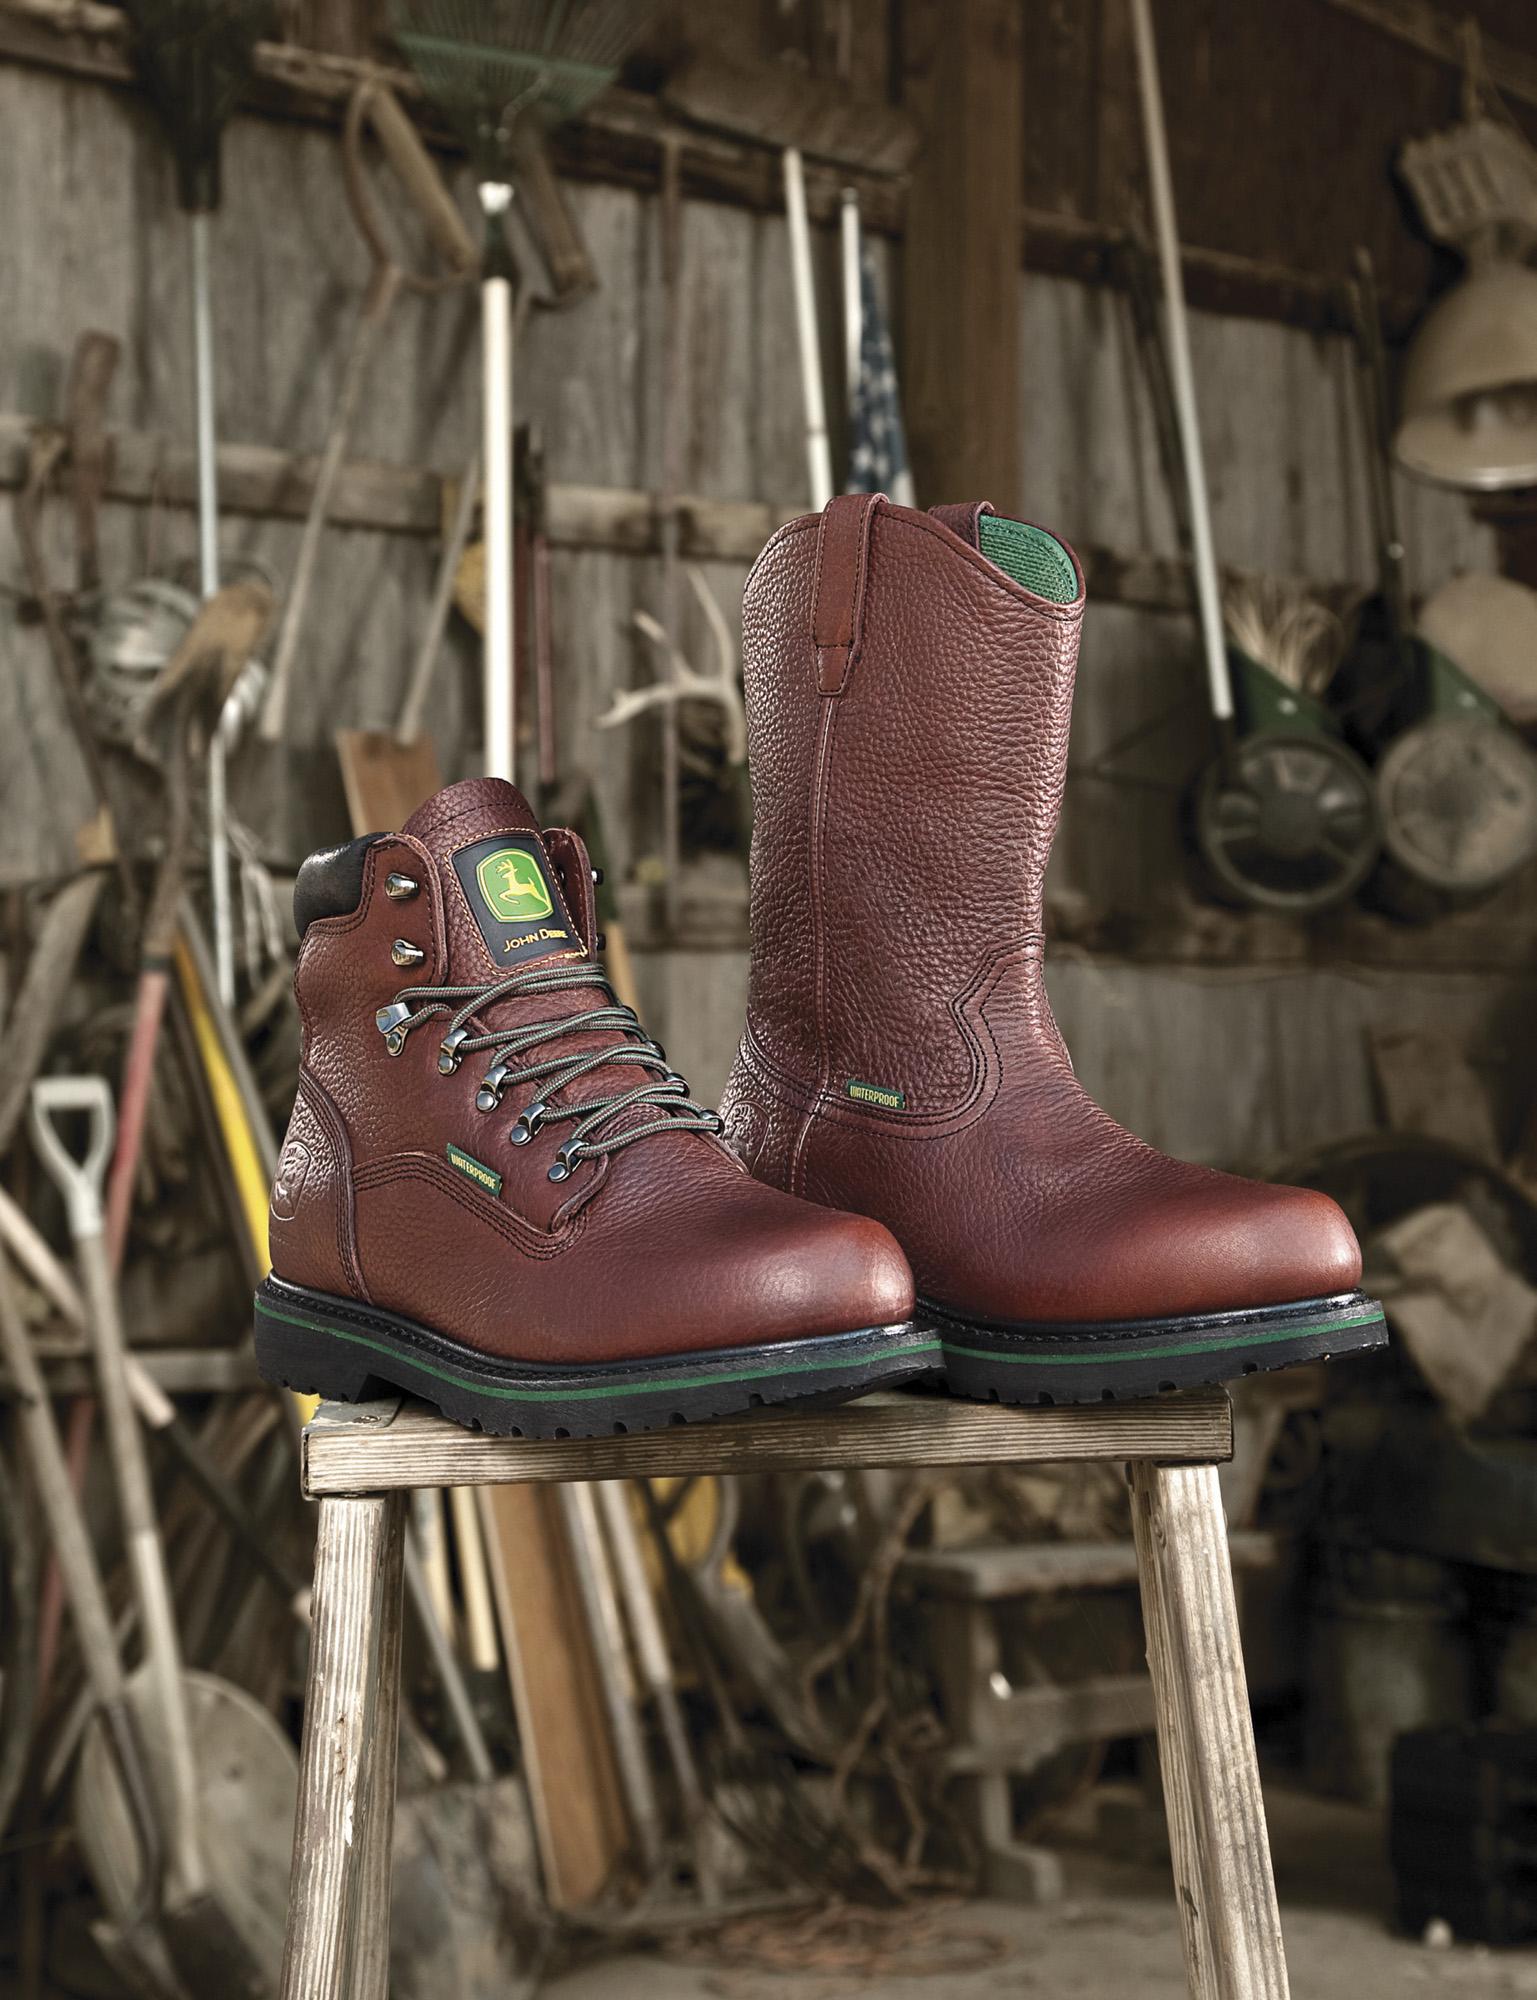 Farm boots made by John Deere